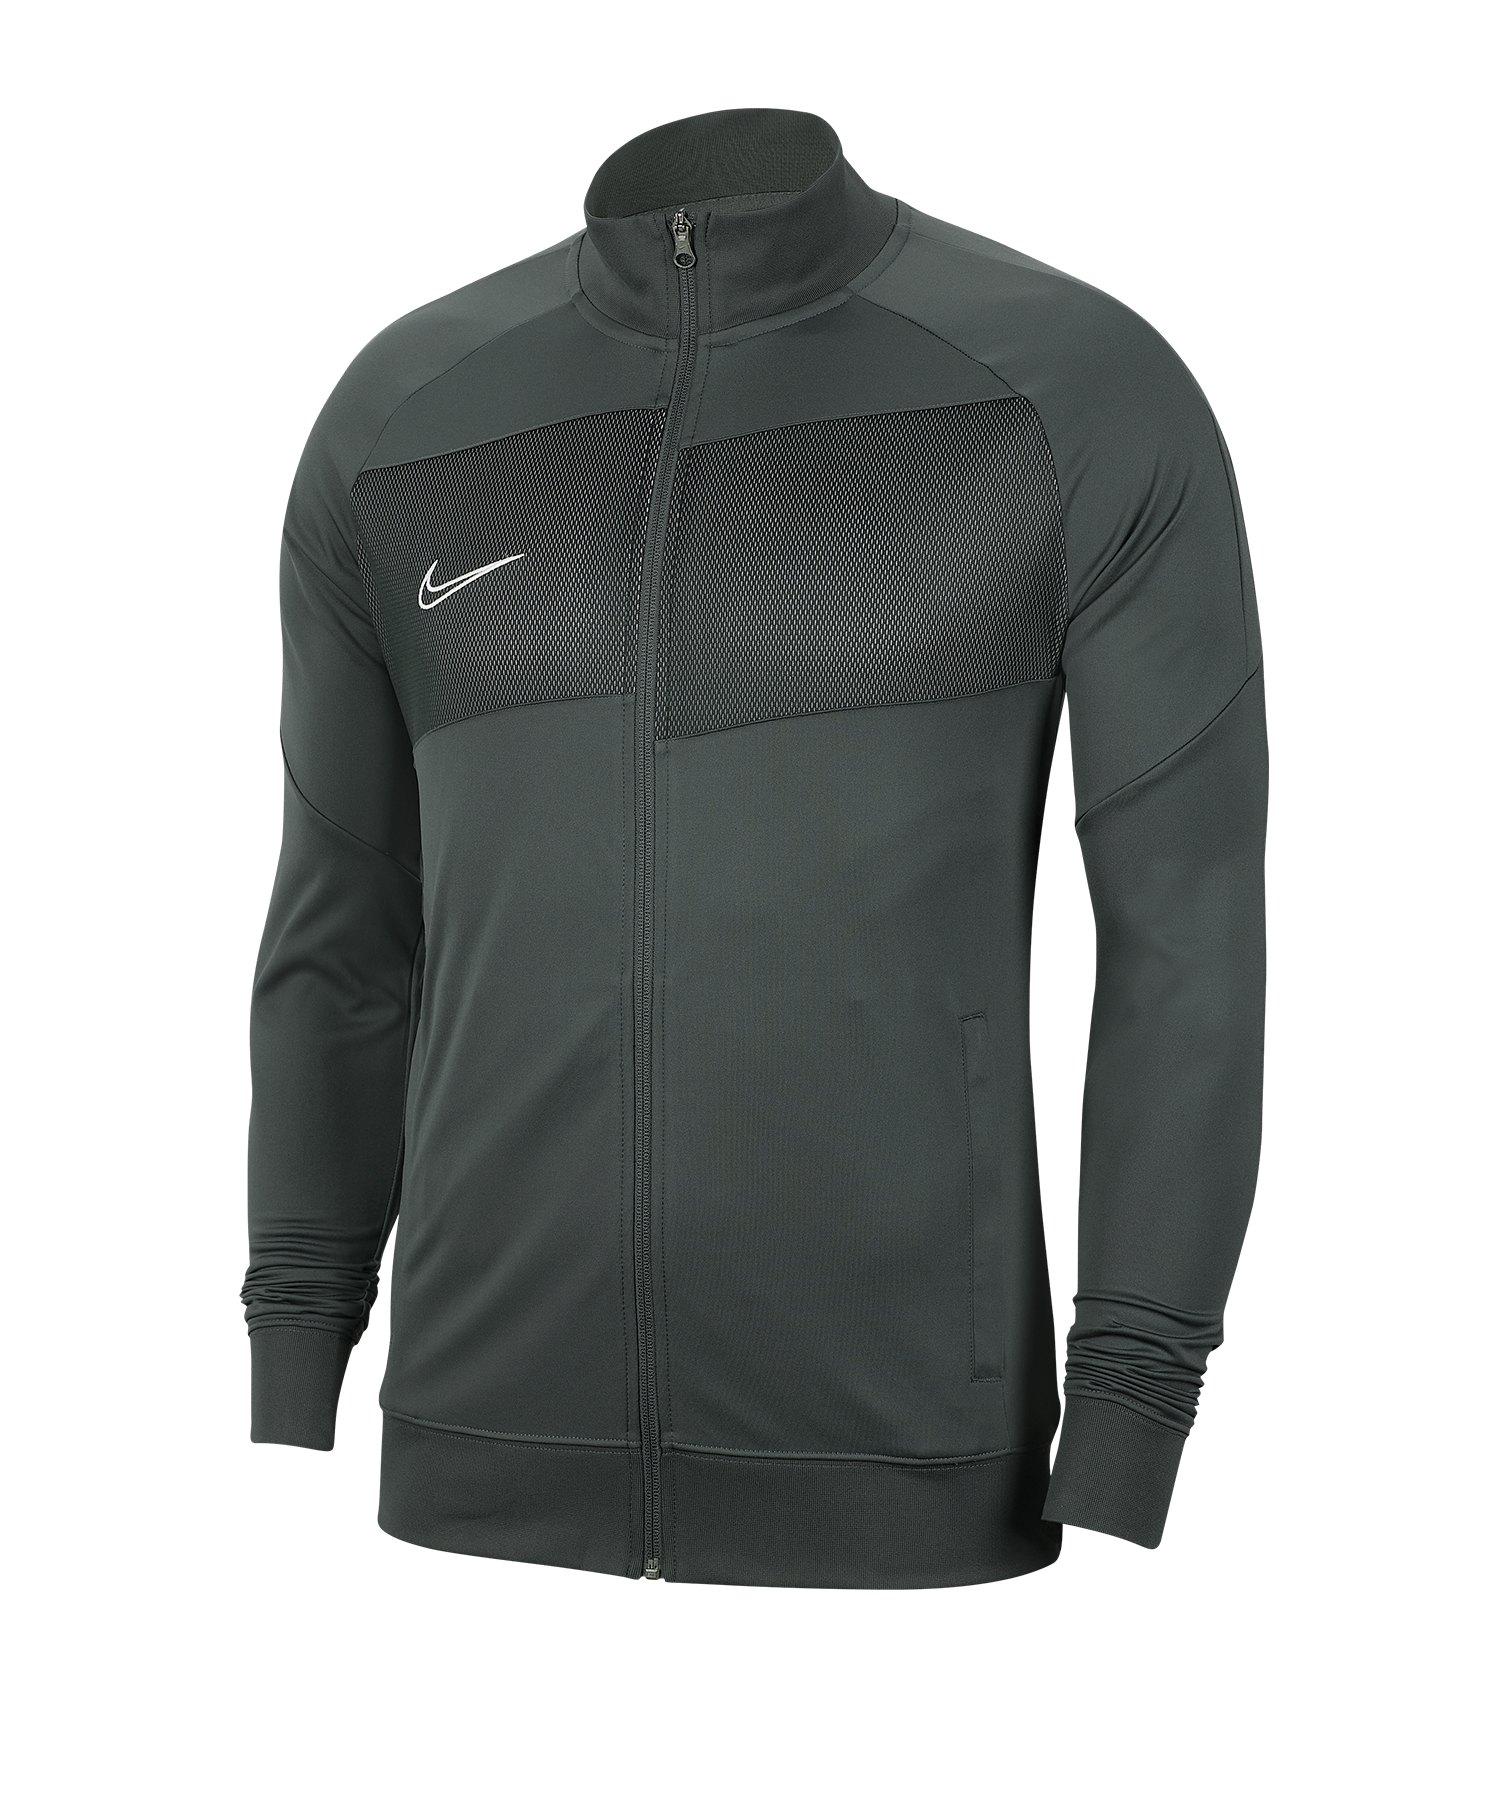 Nike Academy 20 Jacke Kids Grau F061 - grau